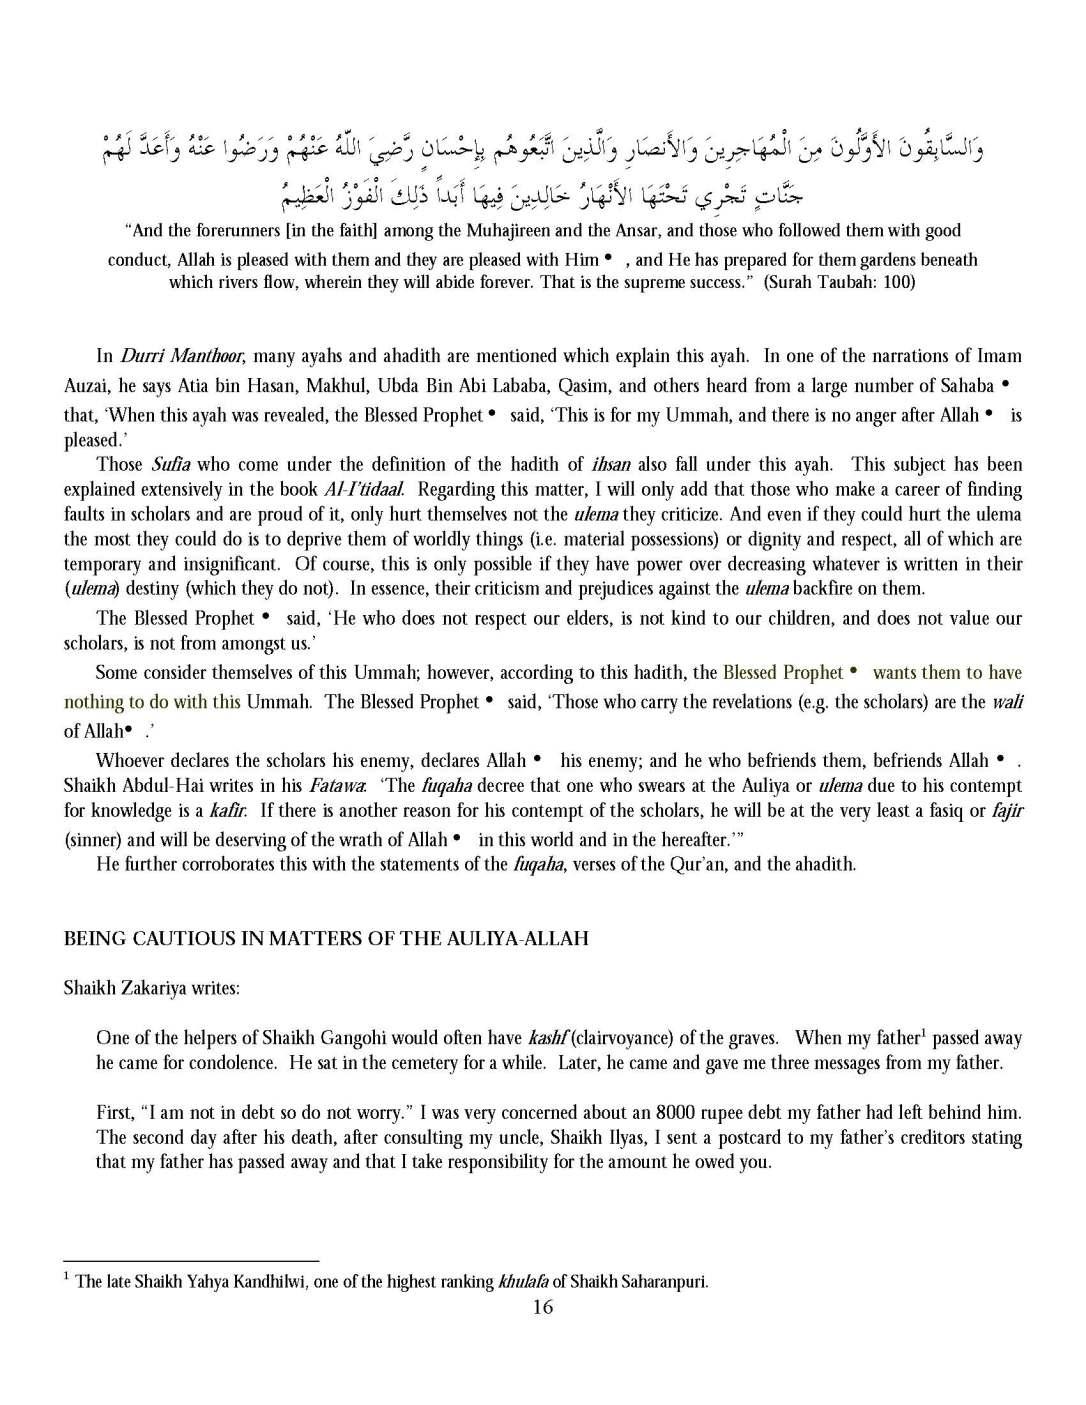 ConsequencesOfDebasingAuliyaAllah_Page_17